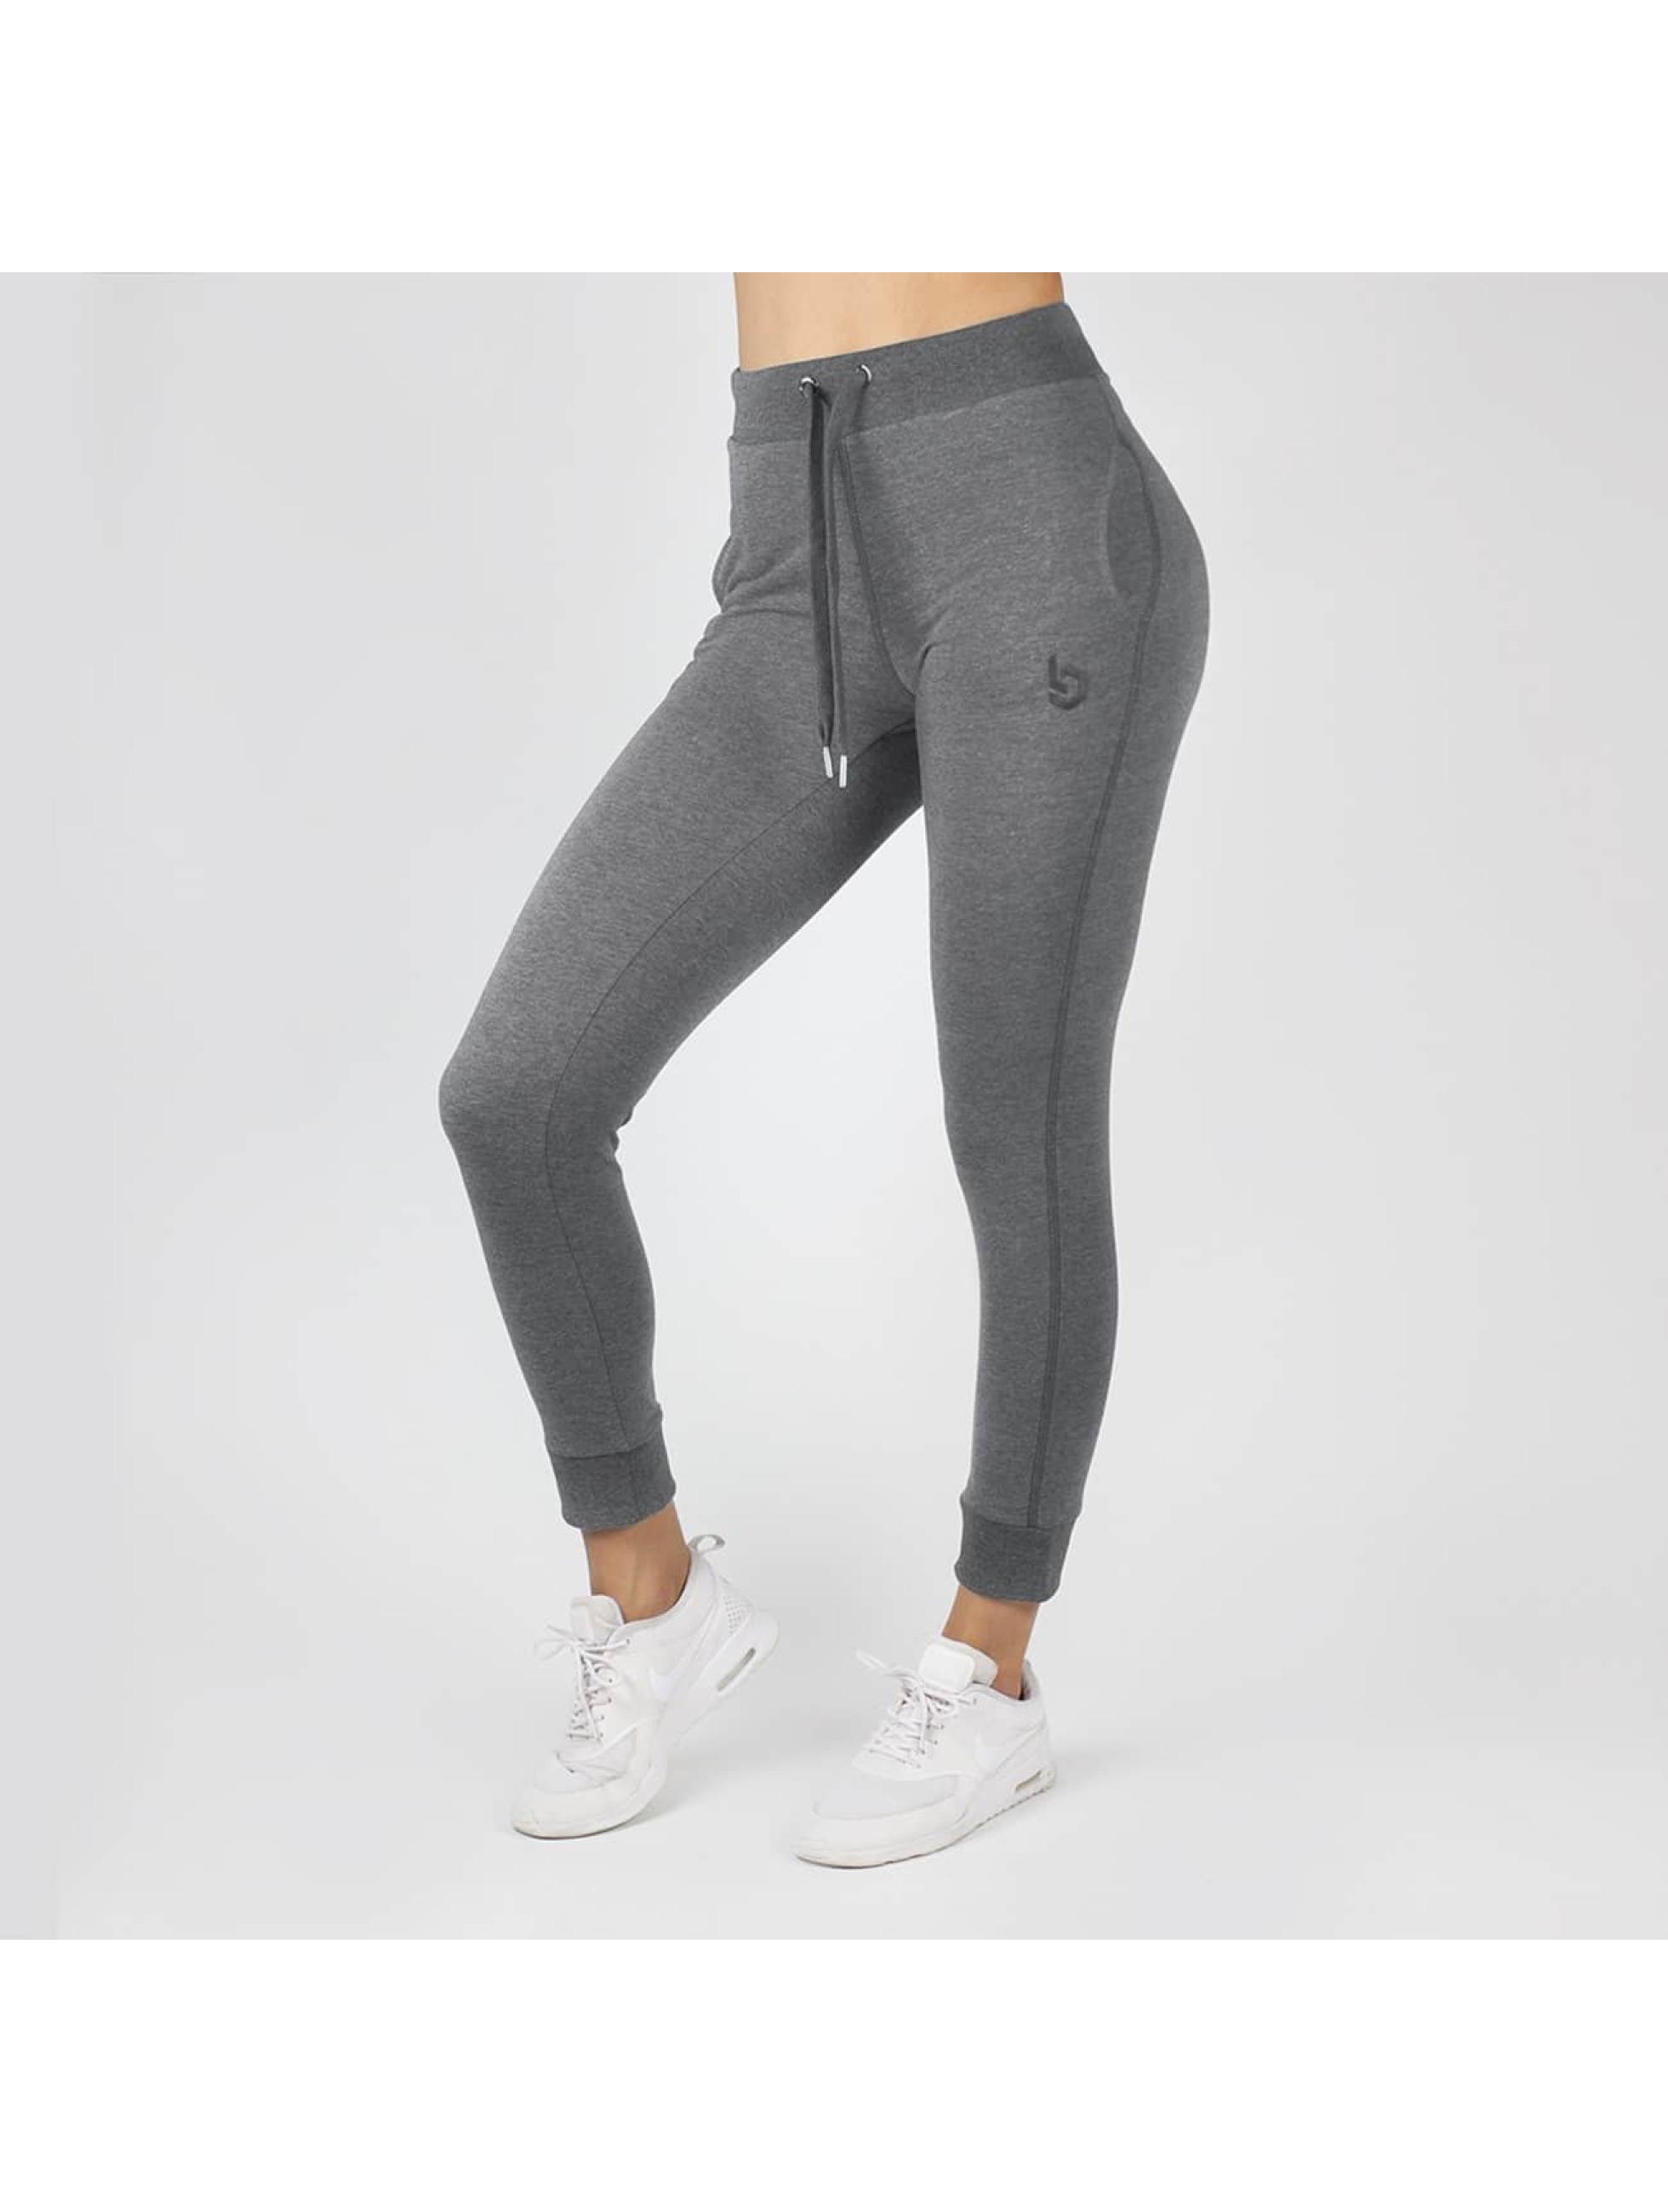 Beyond Limits Legging Motion grijs